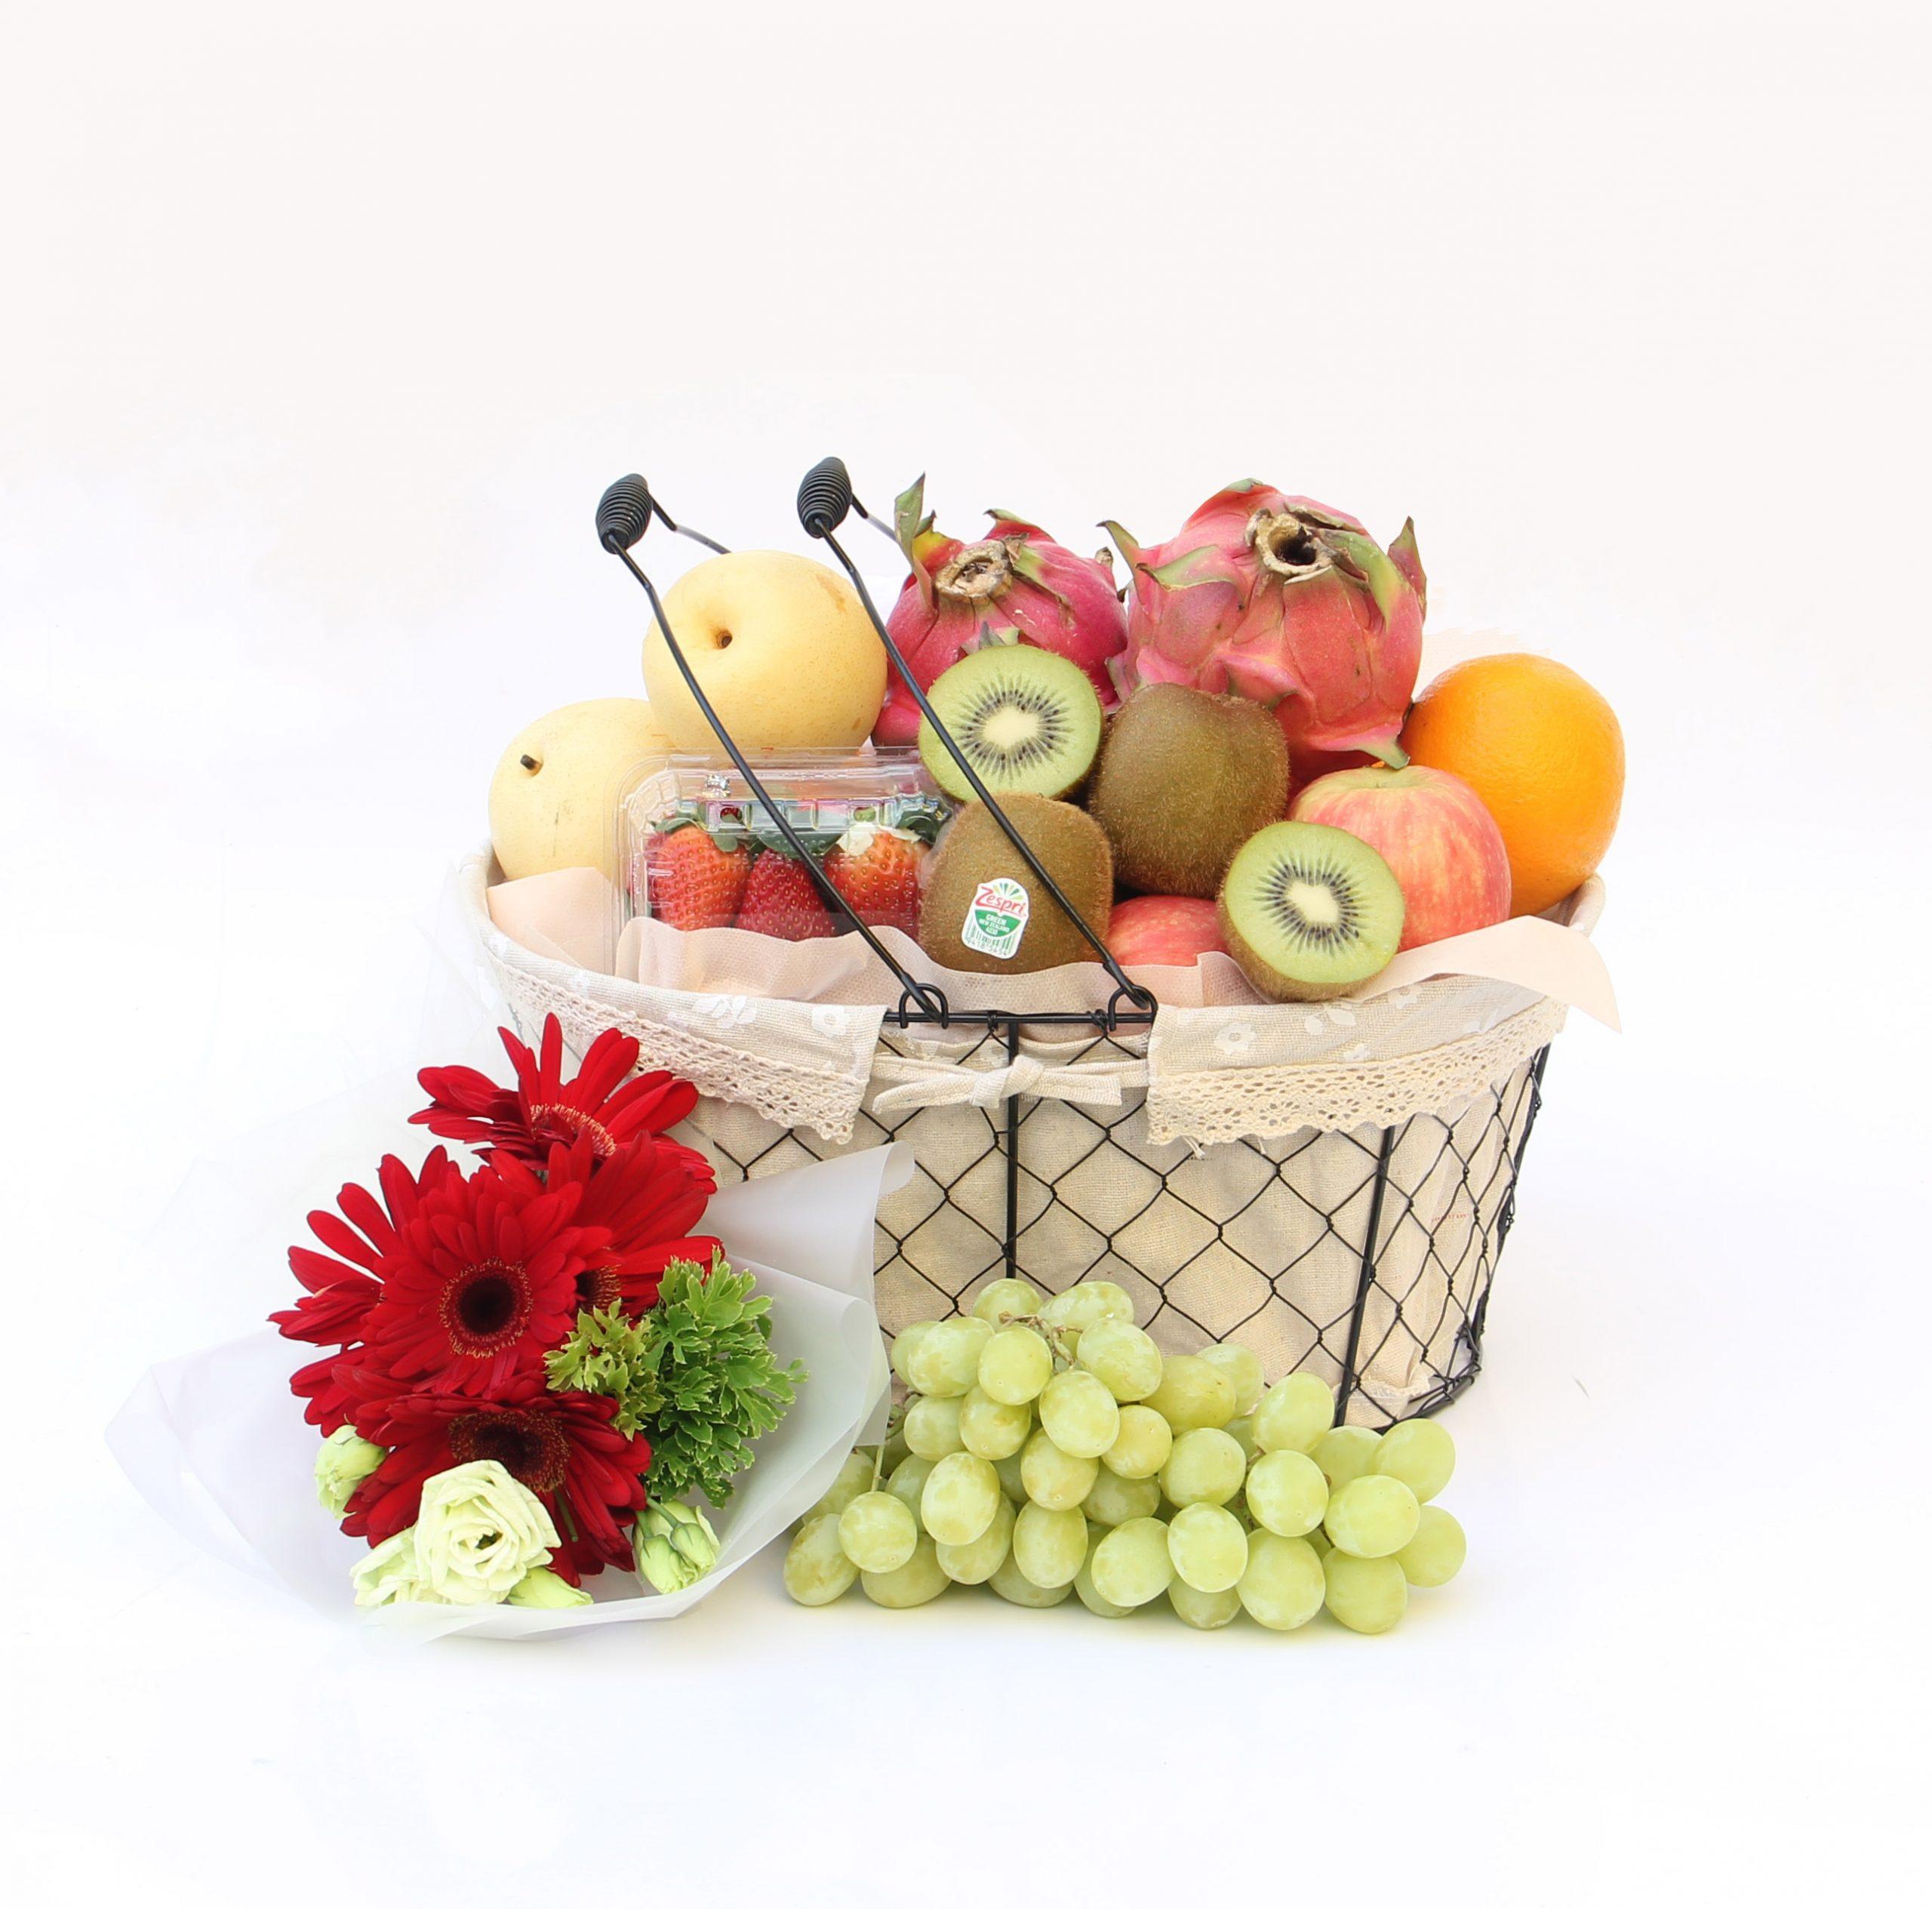 Basket full of fruits with flowers | Fruits Basket | Eska Creative Gifting